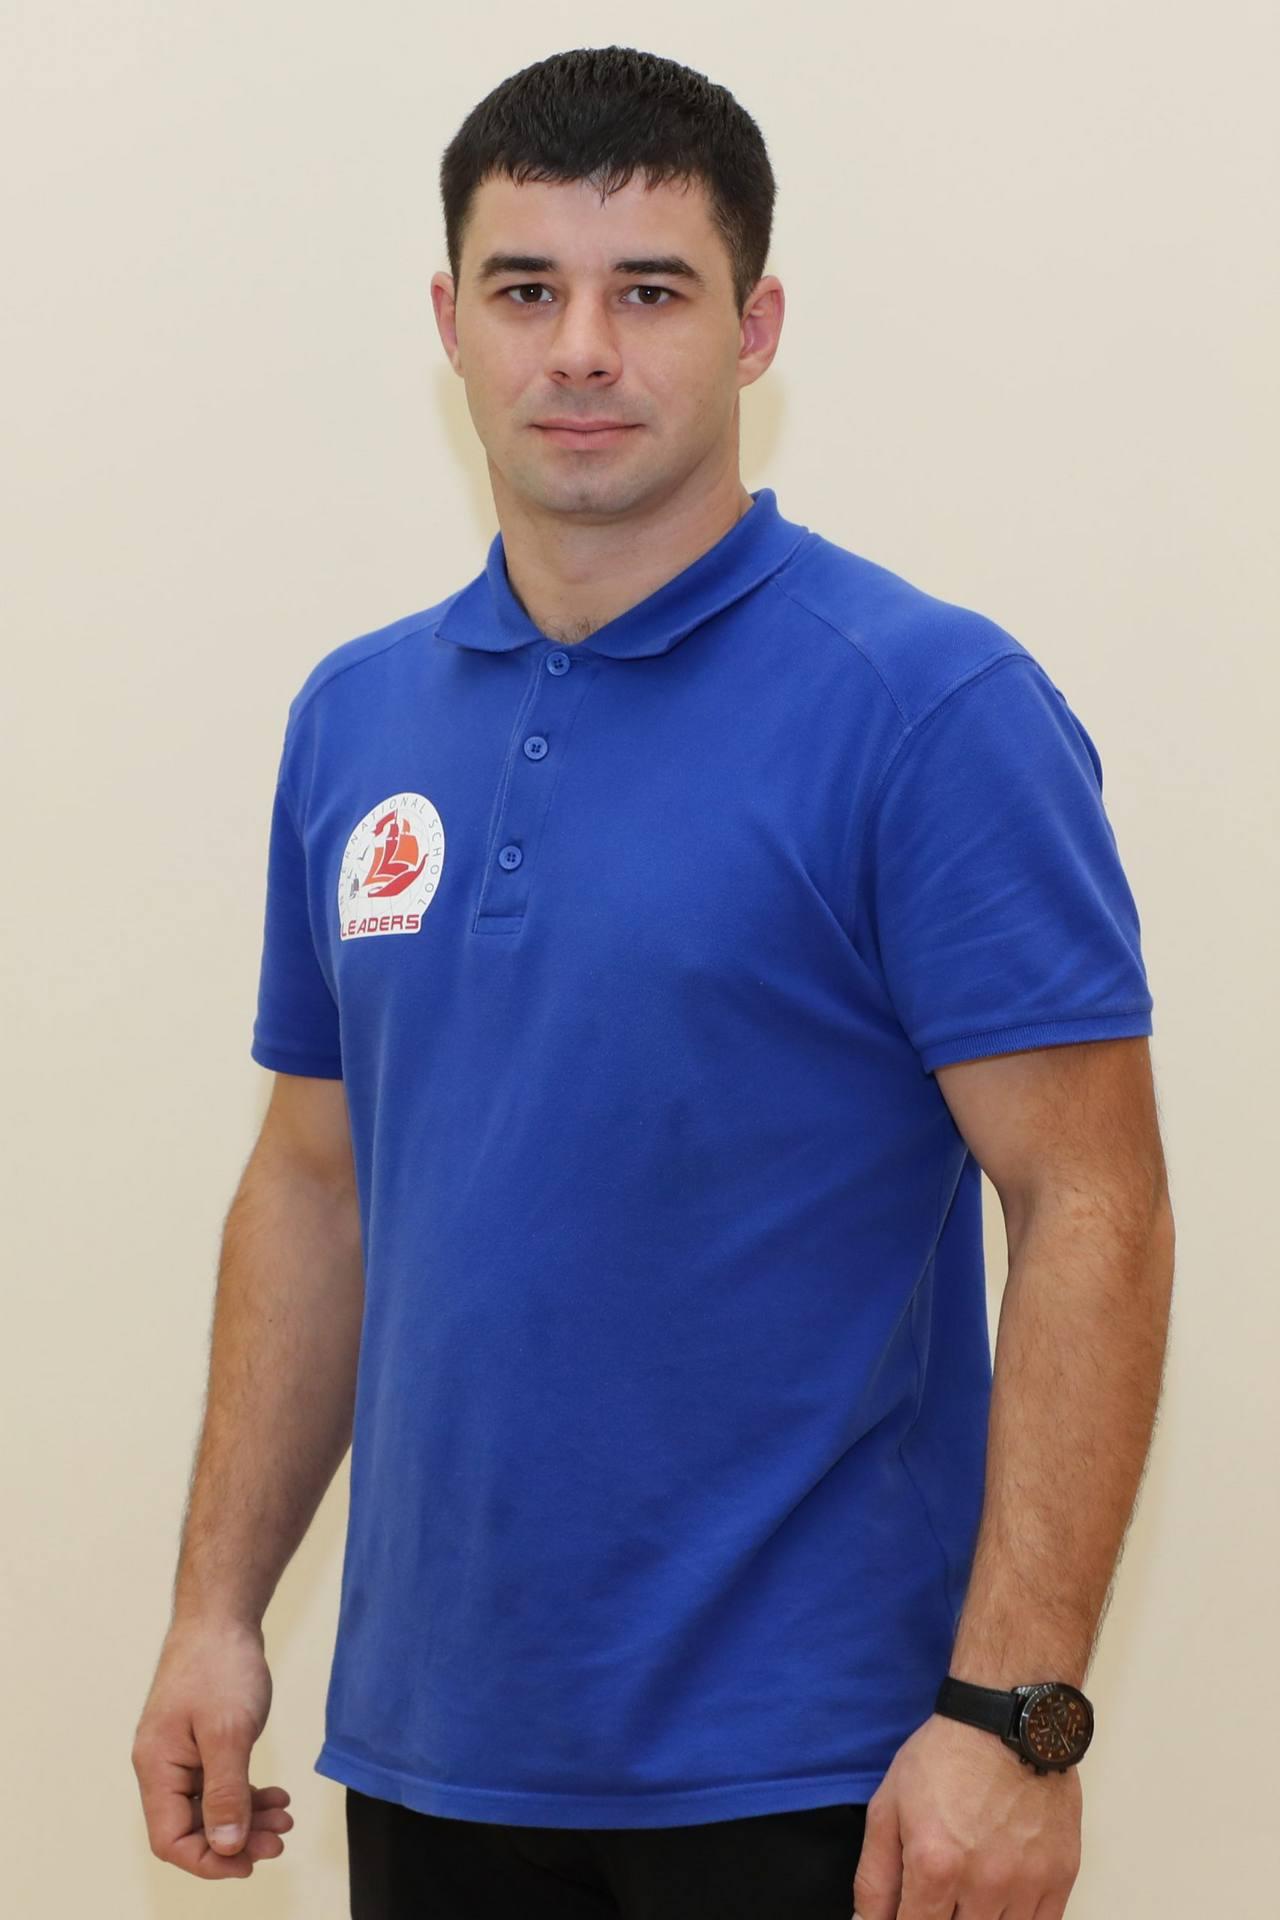 Тимофеев Александр Сергеевич